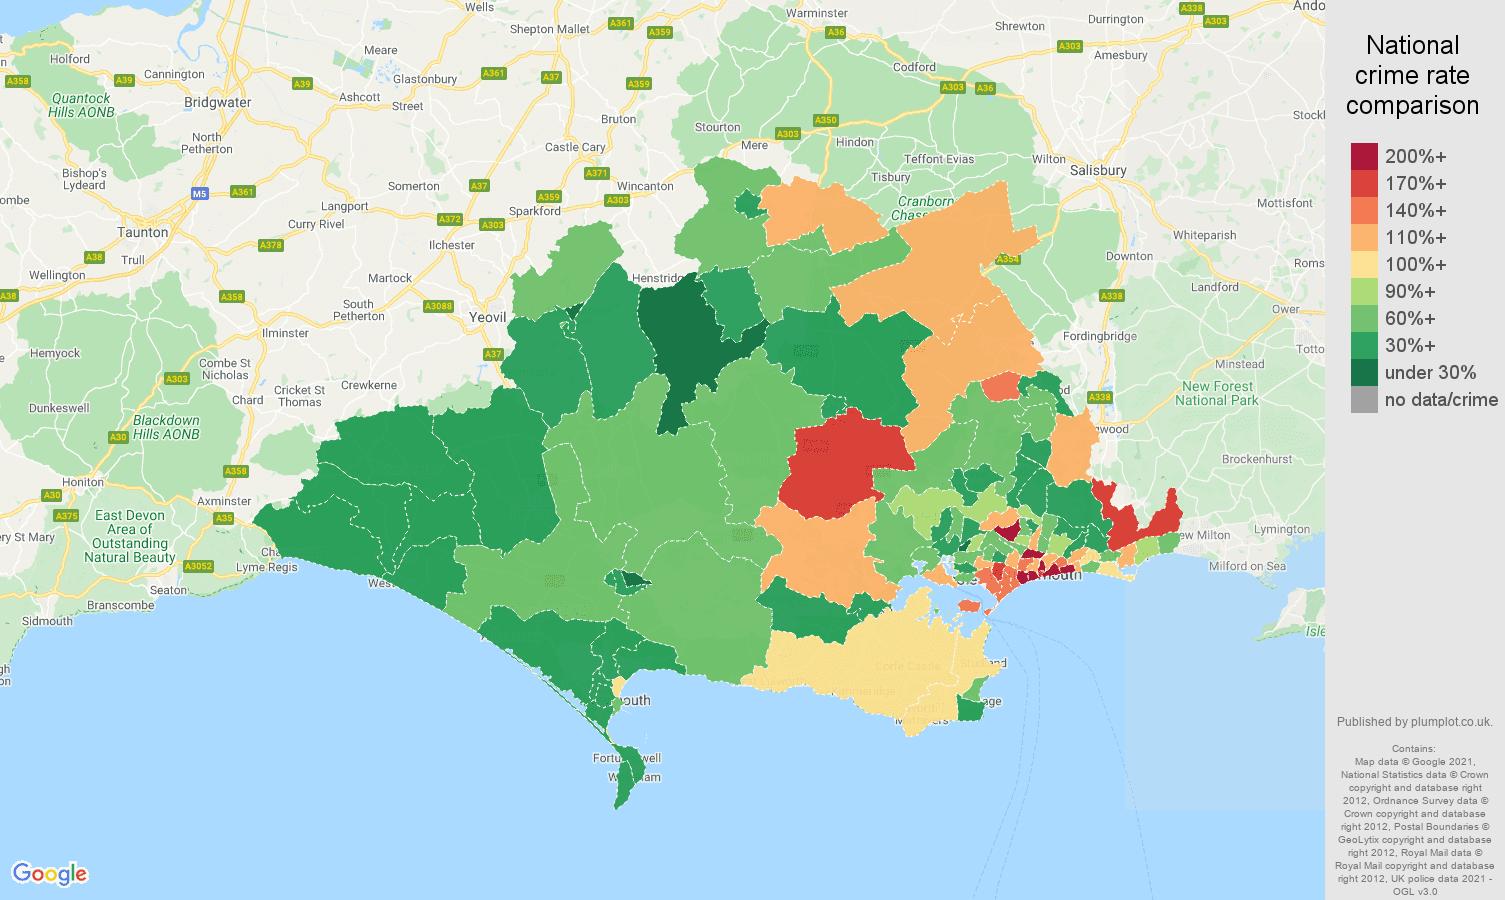 Dorset burglary crime rate comparison map